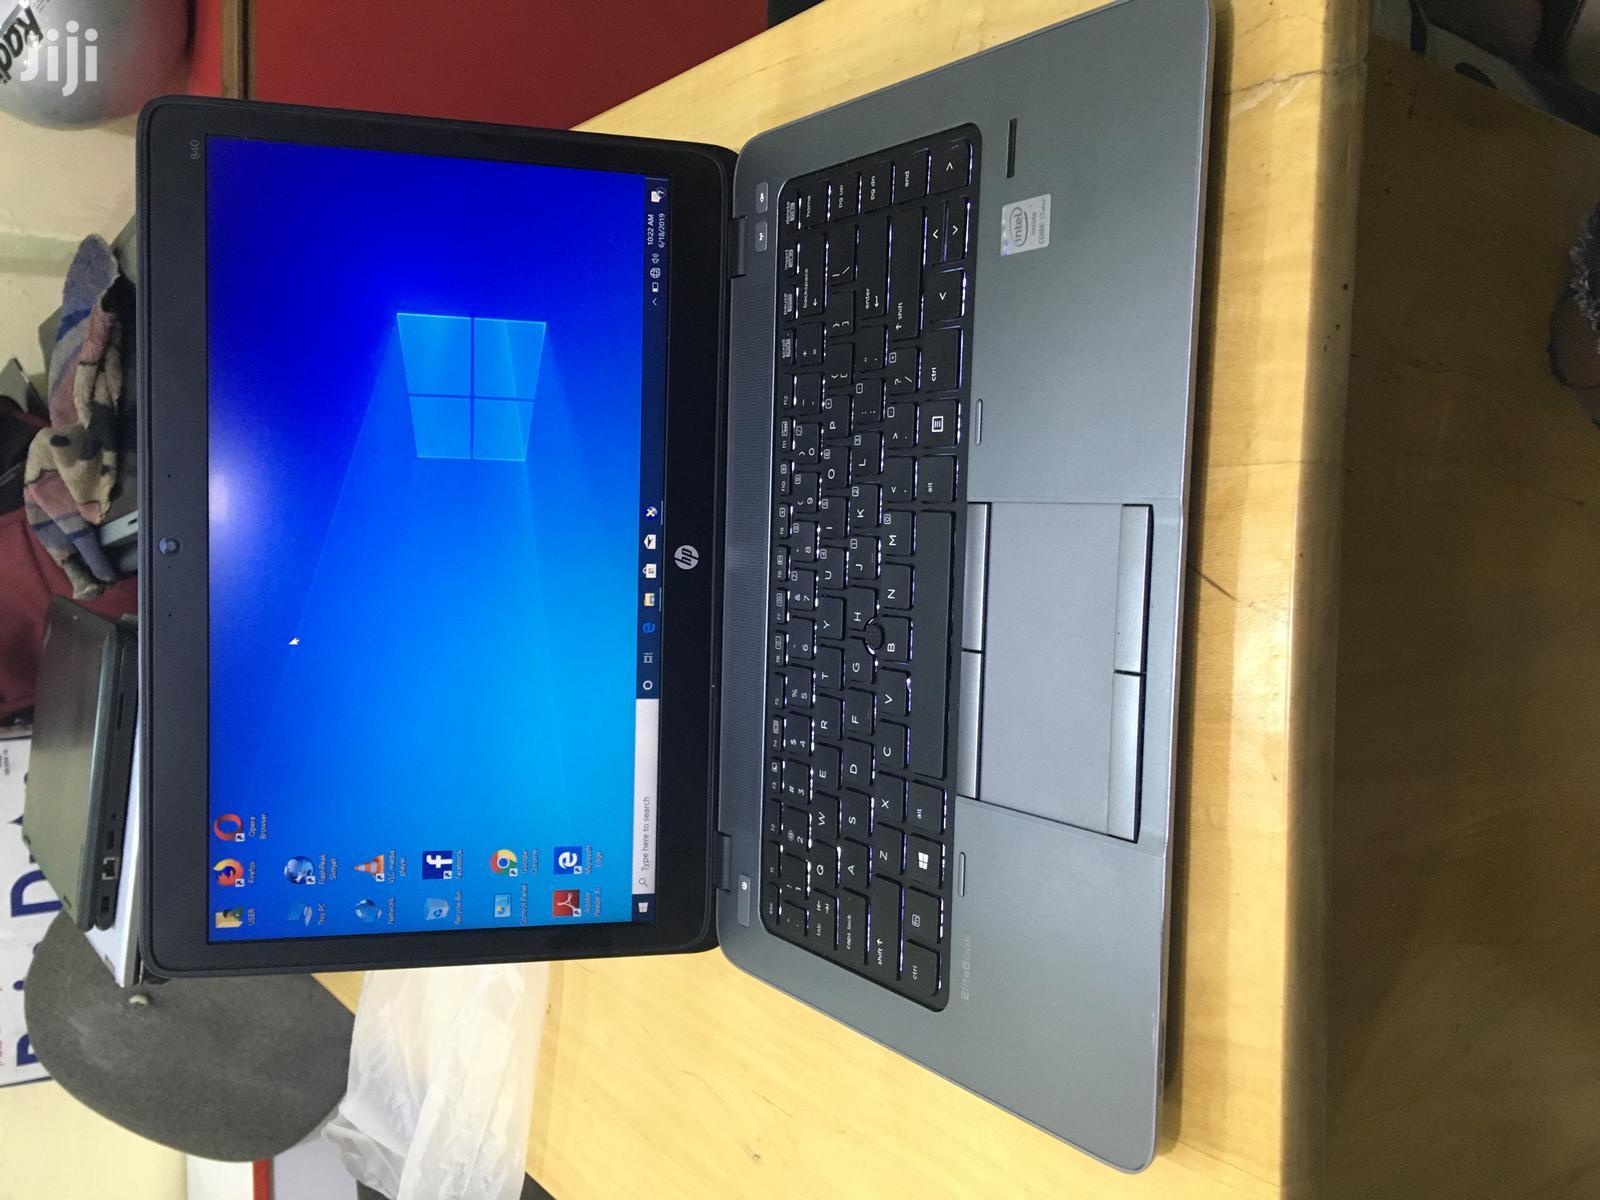 Laptop HP EliteBook 840 G1 4GB Intel Core I7 HDD 750GB | Laptops & Computers for sale in Kampala, Central Region, Uganda